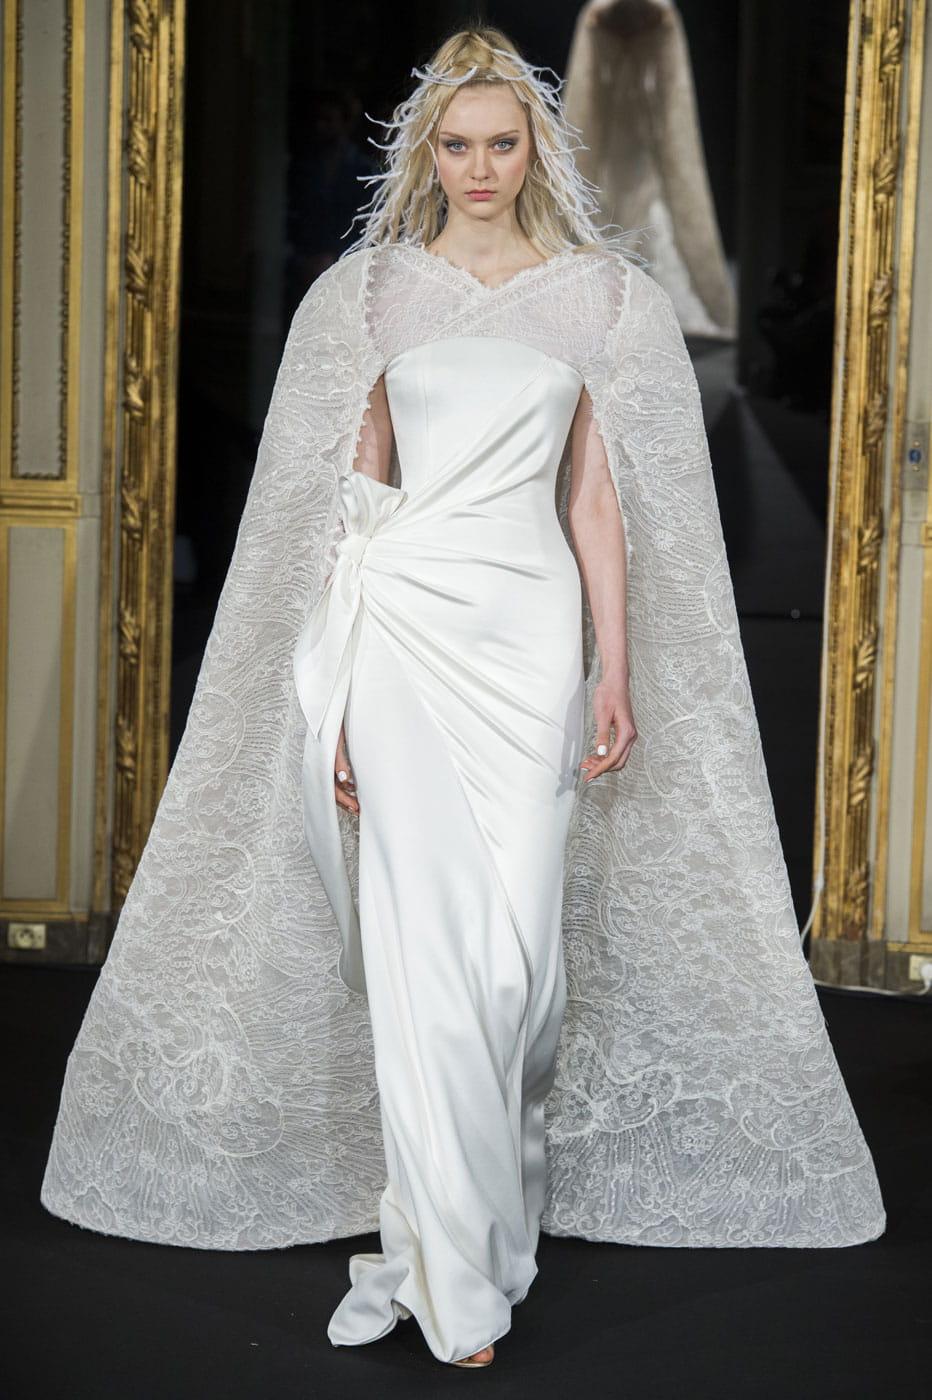 Robe de mari e alexis mabille atypique haute couture for Prix de robe de mariage en or georges chakra